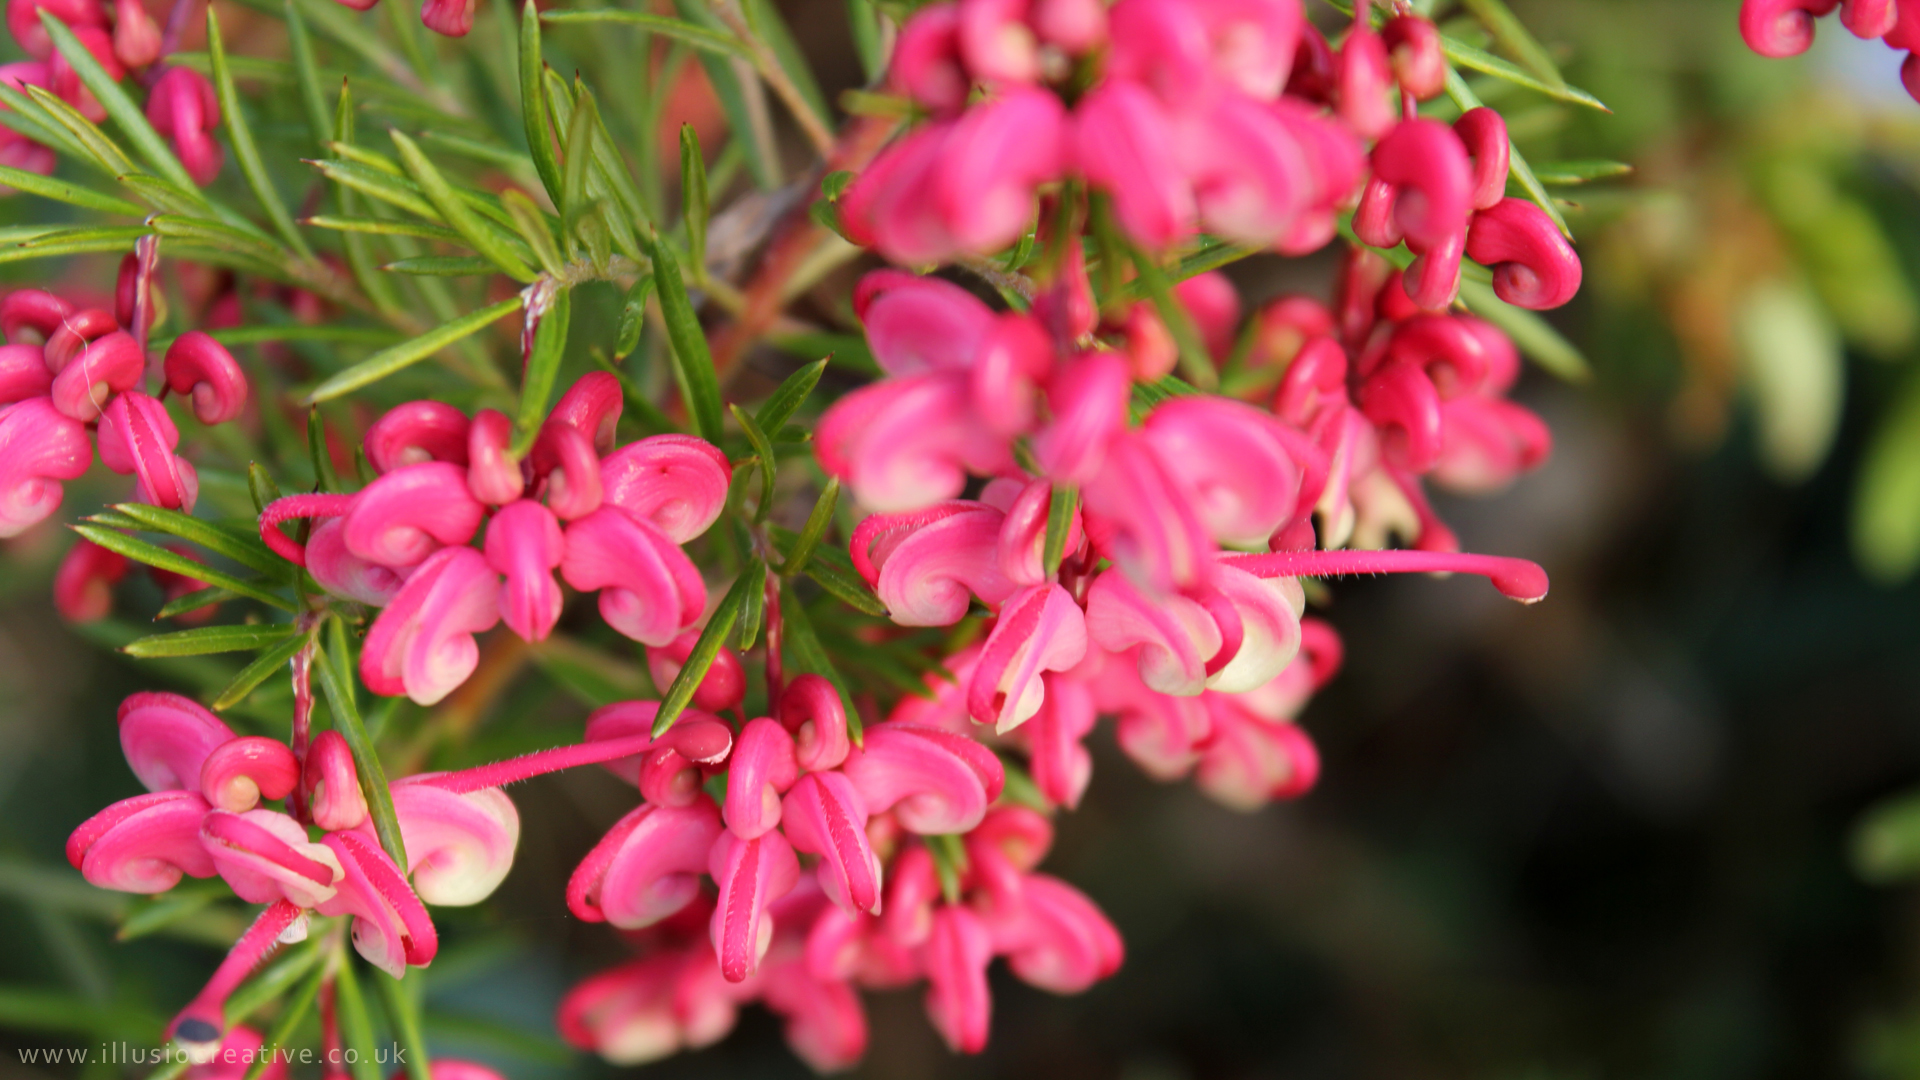 Lorrie Whittington Little Pink Flowers 1290 X1080